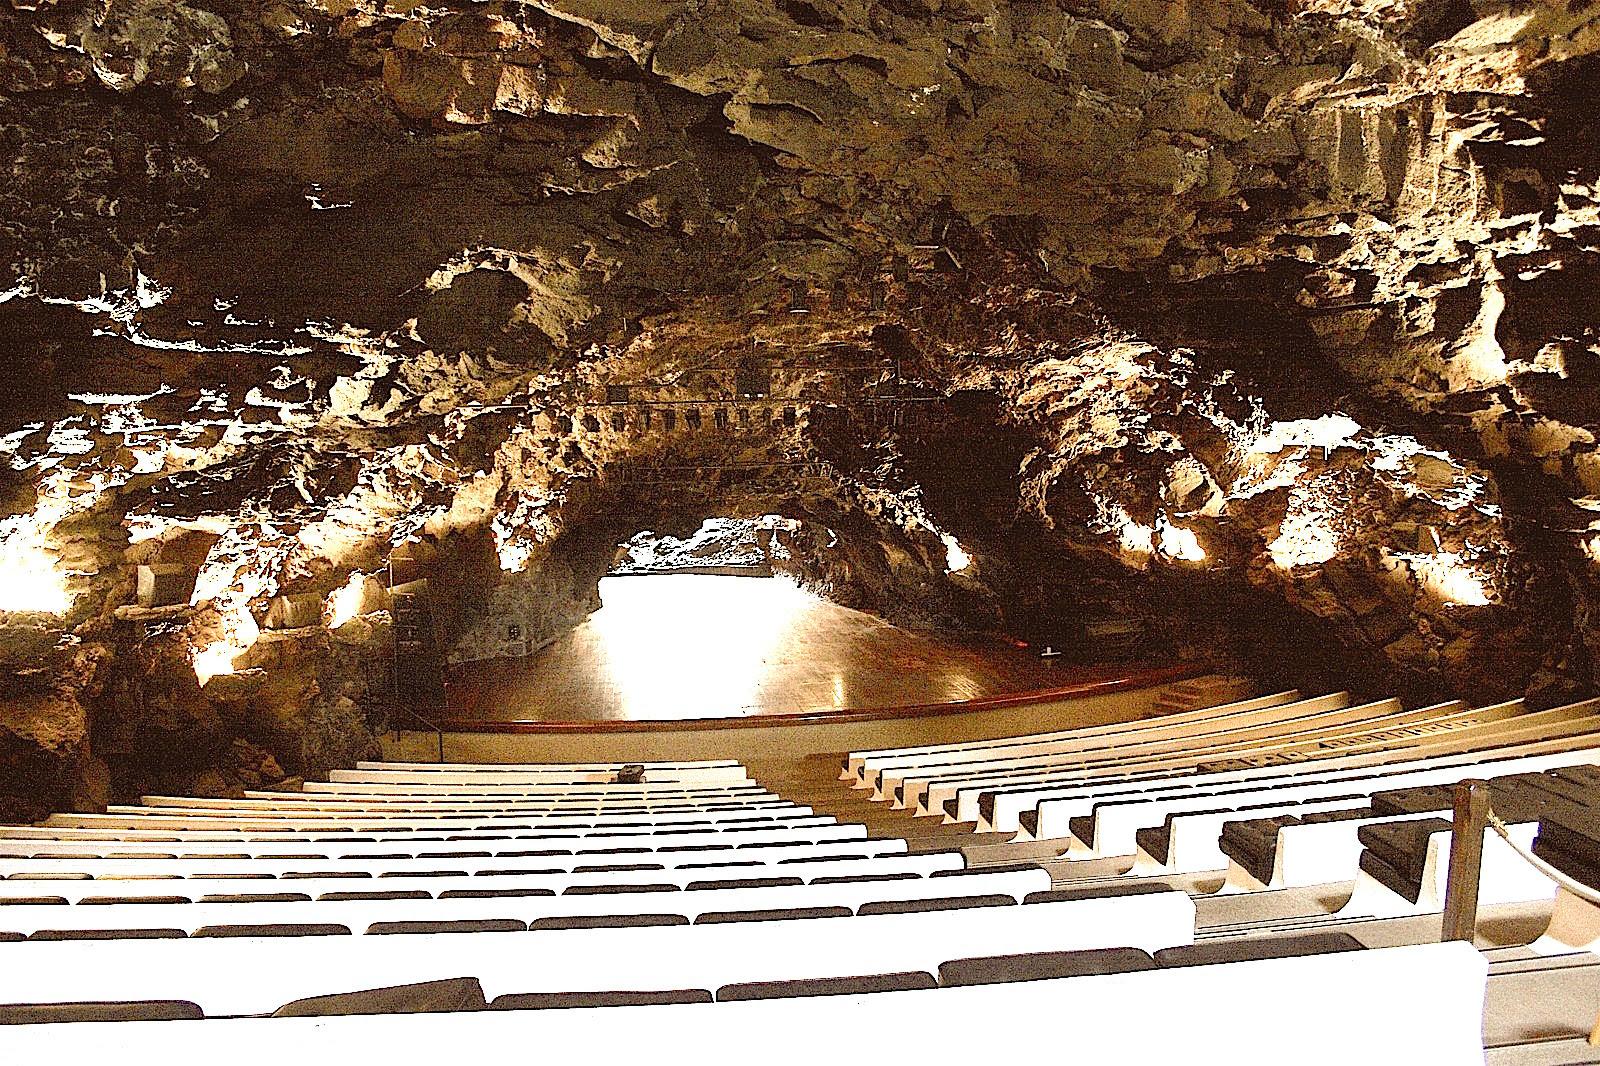 Auditorio de música - Jameos del Agua